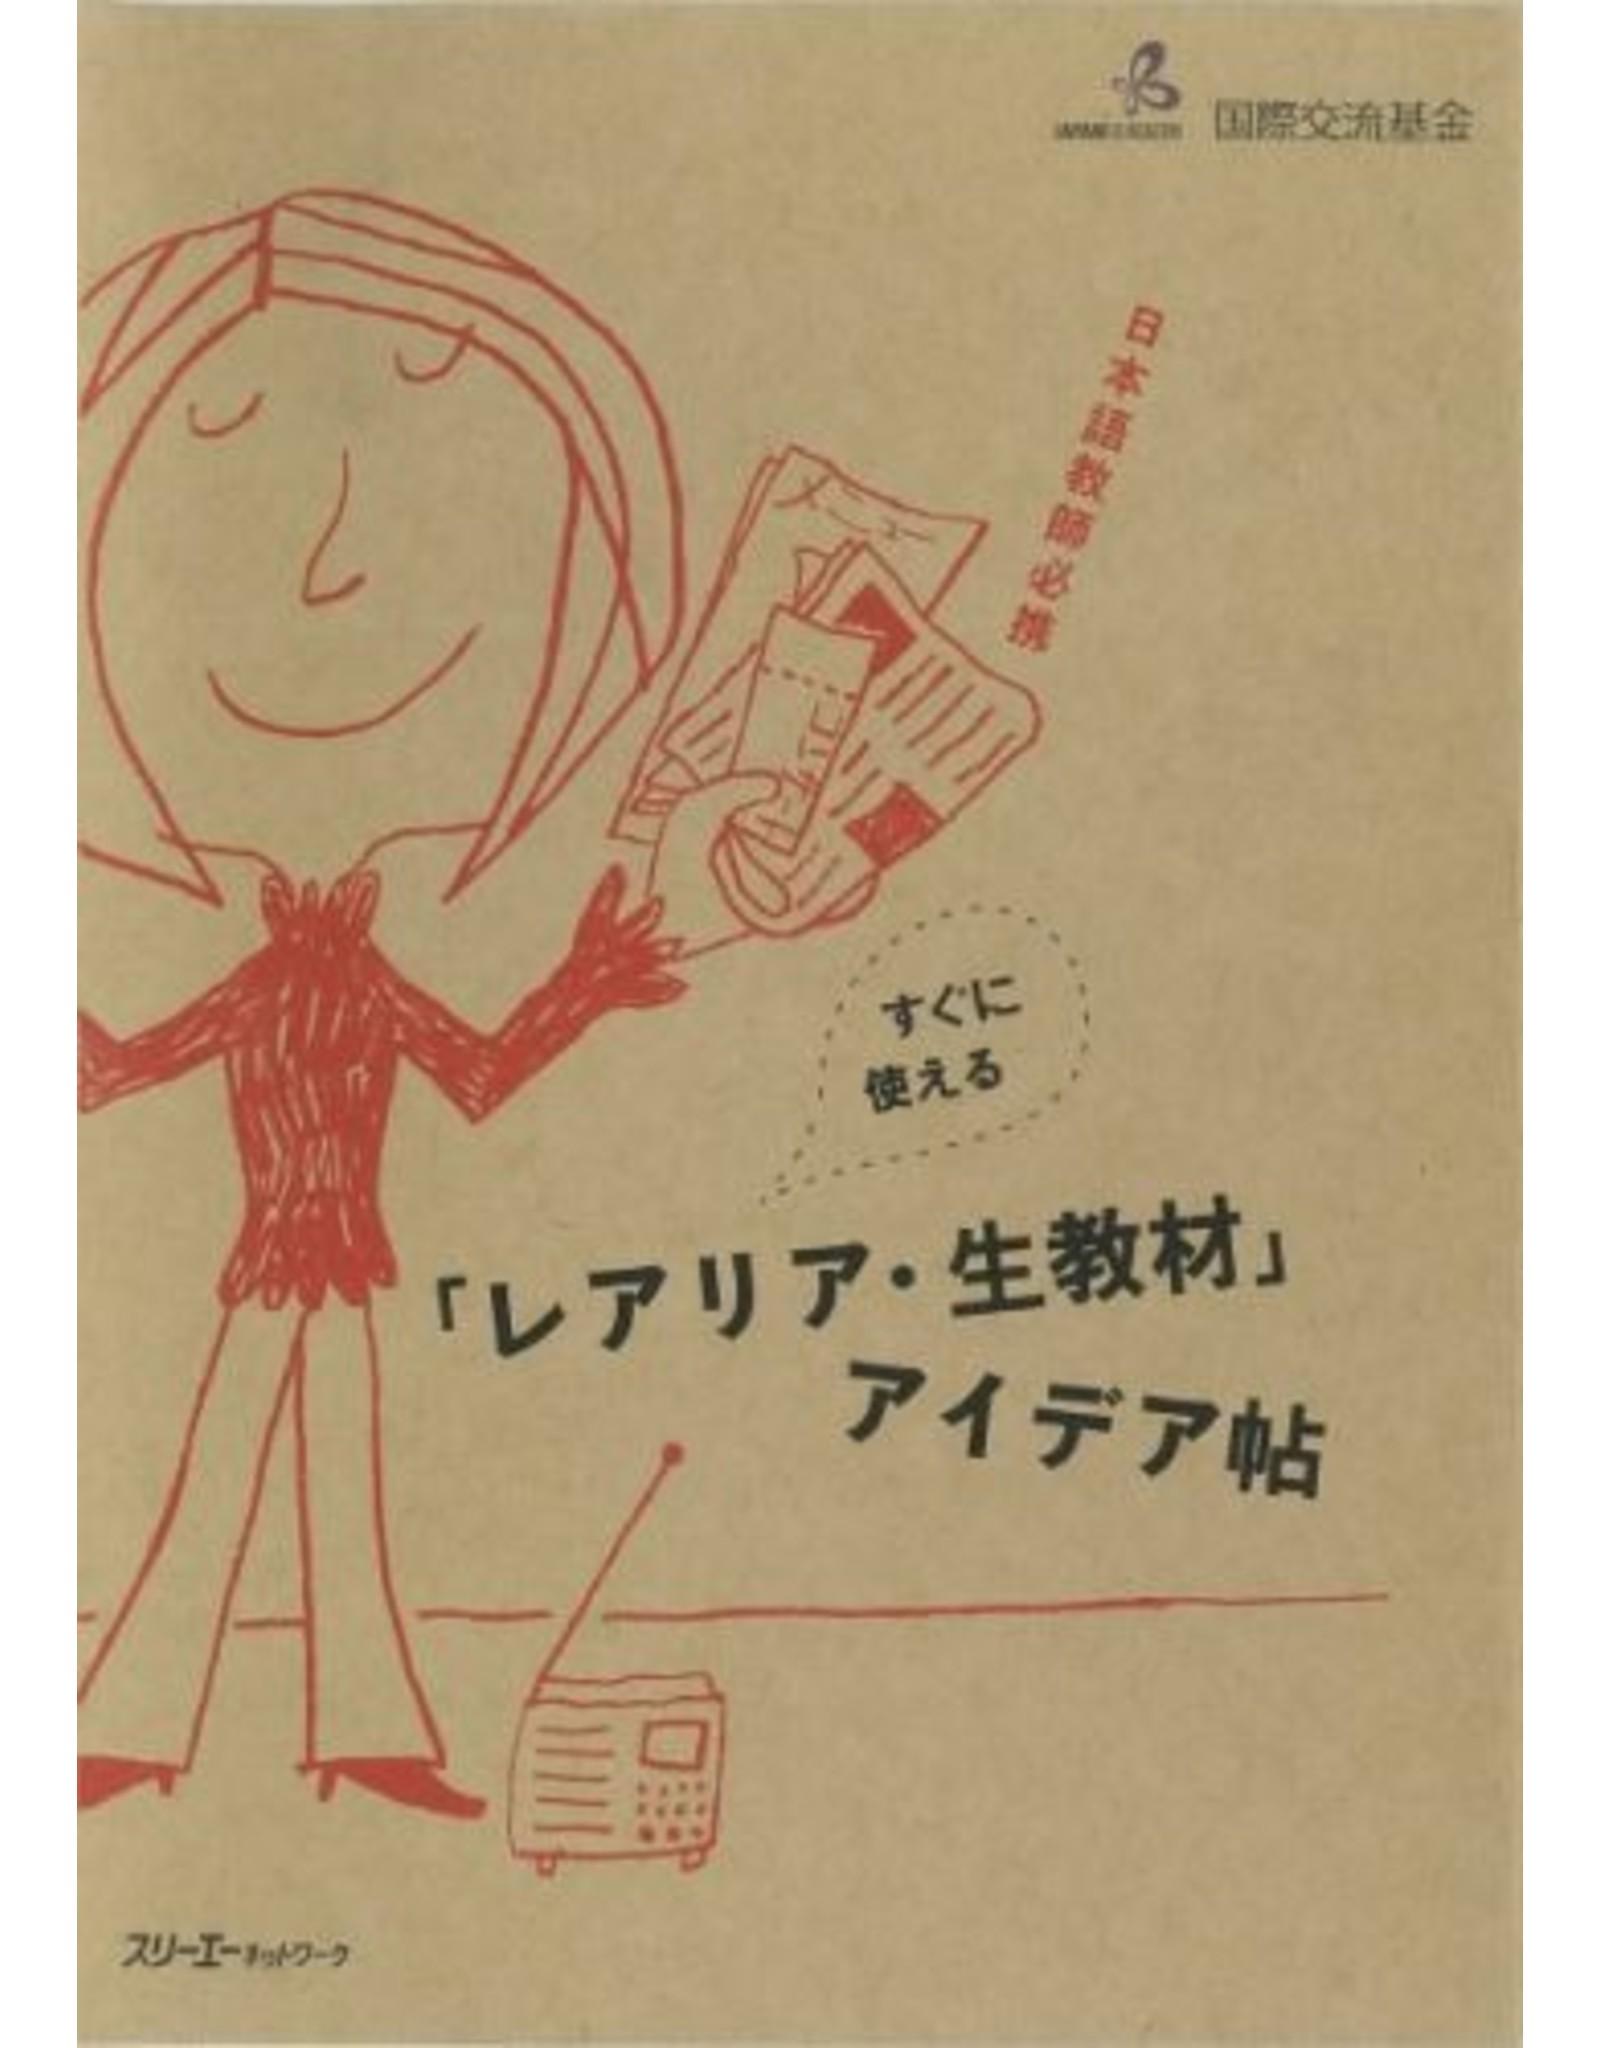 3A Corporation RARELIA NAMA-KYOZAI IDEA-CHO